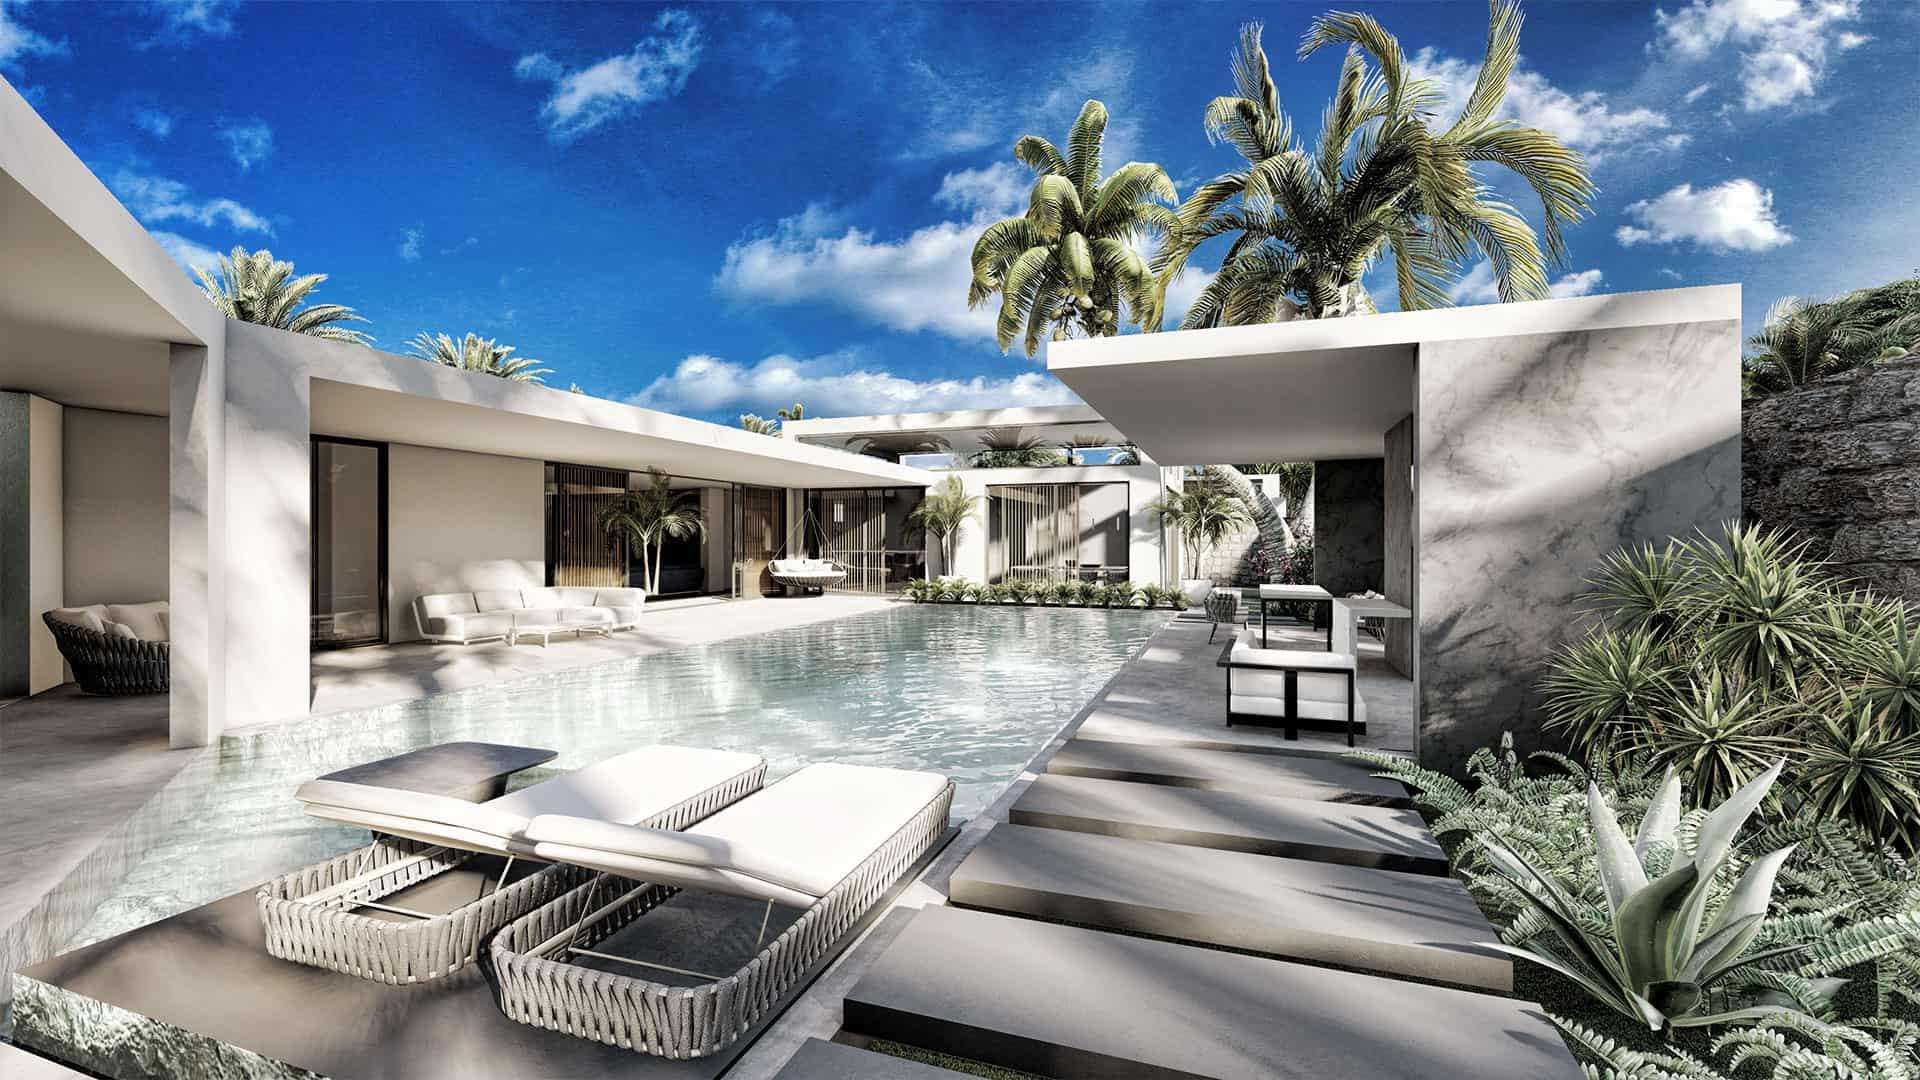 Bespoke Luxury     grand baie île maurice _ www.immobilier-swiss.ch                    